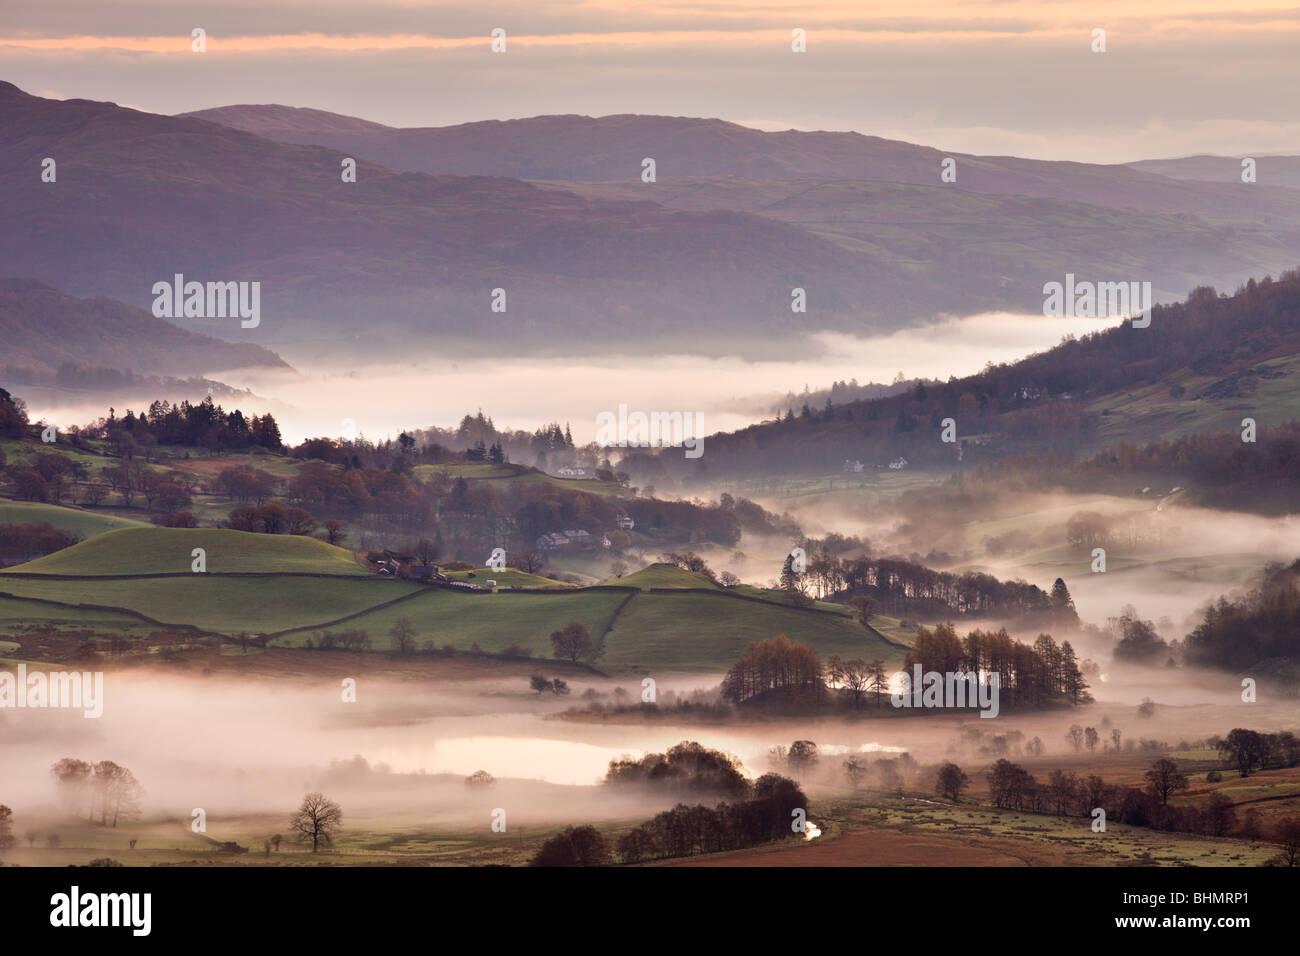 Wenig Langdale umgeben von Nebel bei Sonnenaufgang, Nationalpark Lake District, Cumbria, England, UK. Herbst (November) Stockbild